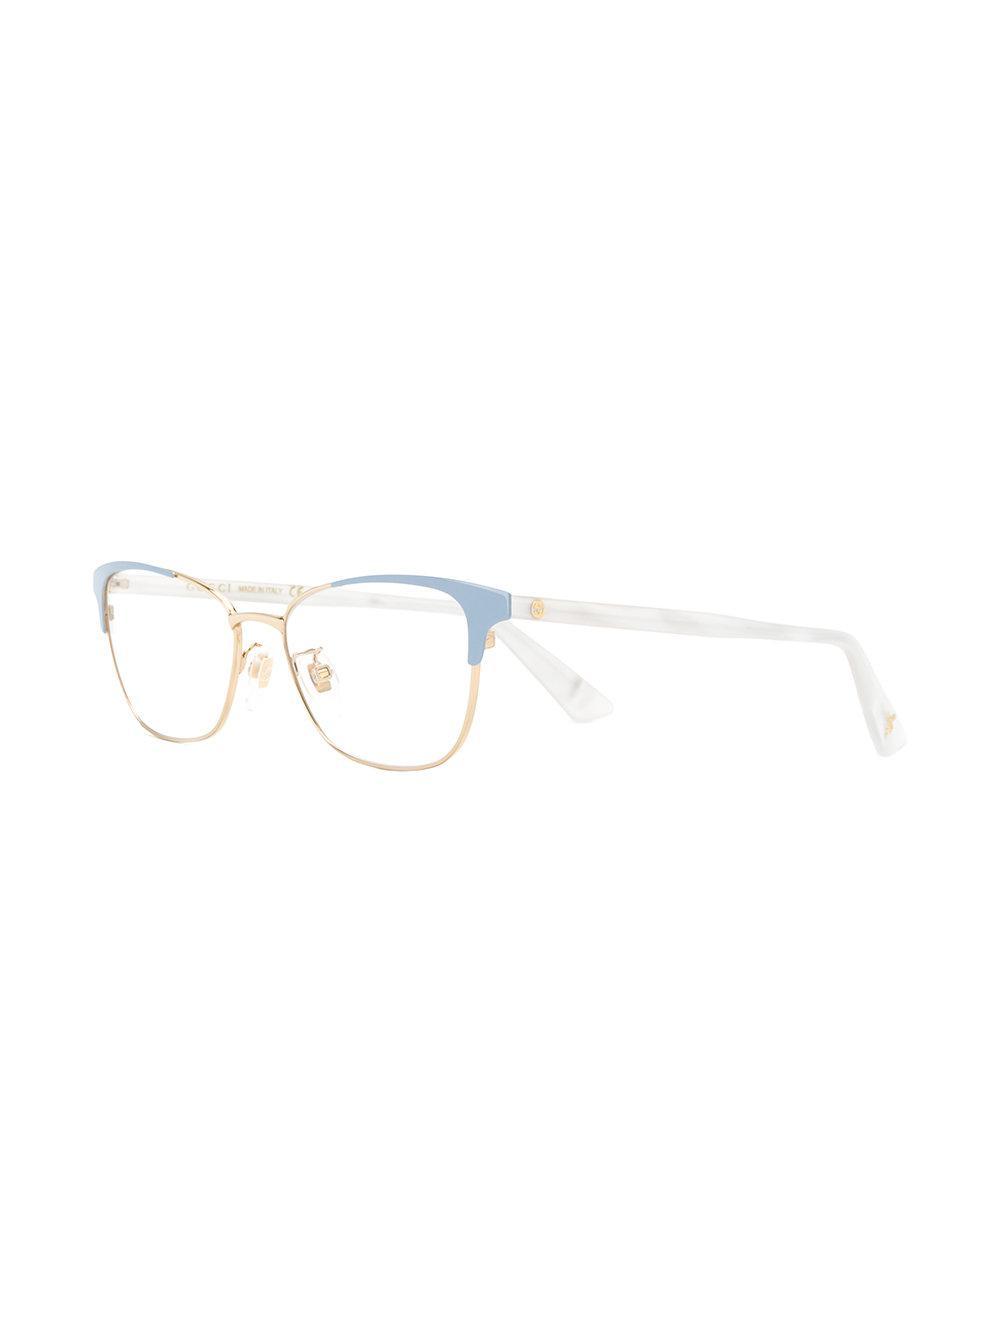 a5ebbc2214e Gucci - Metallic Cat Eye Glasses - Lyst. View fullscreen